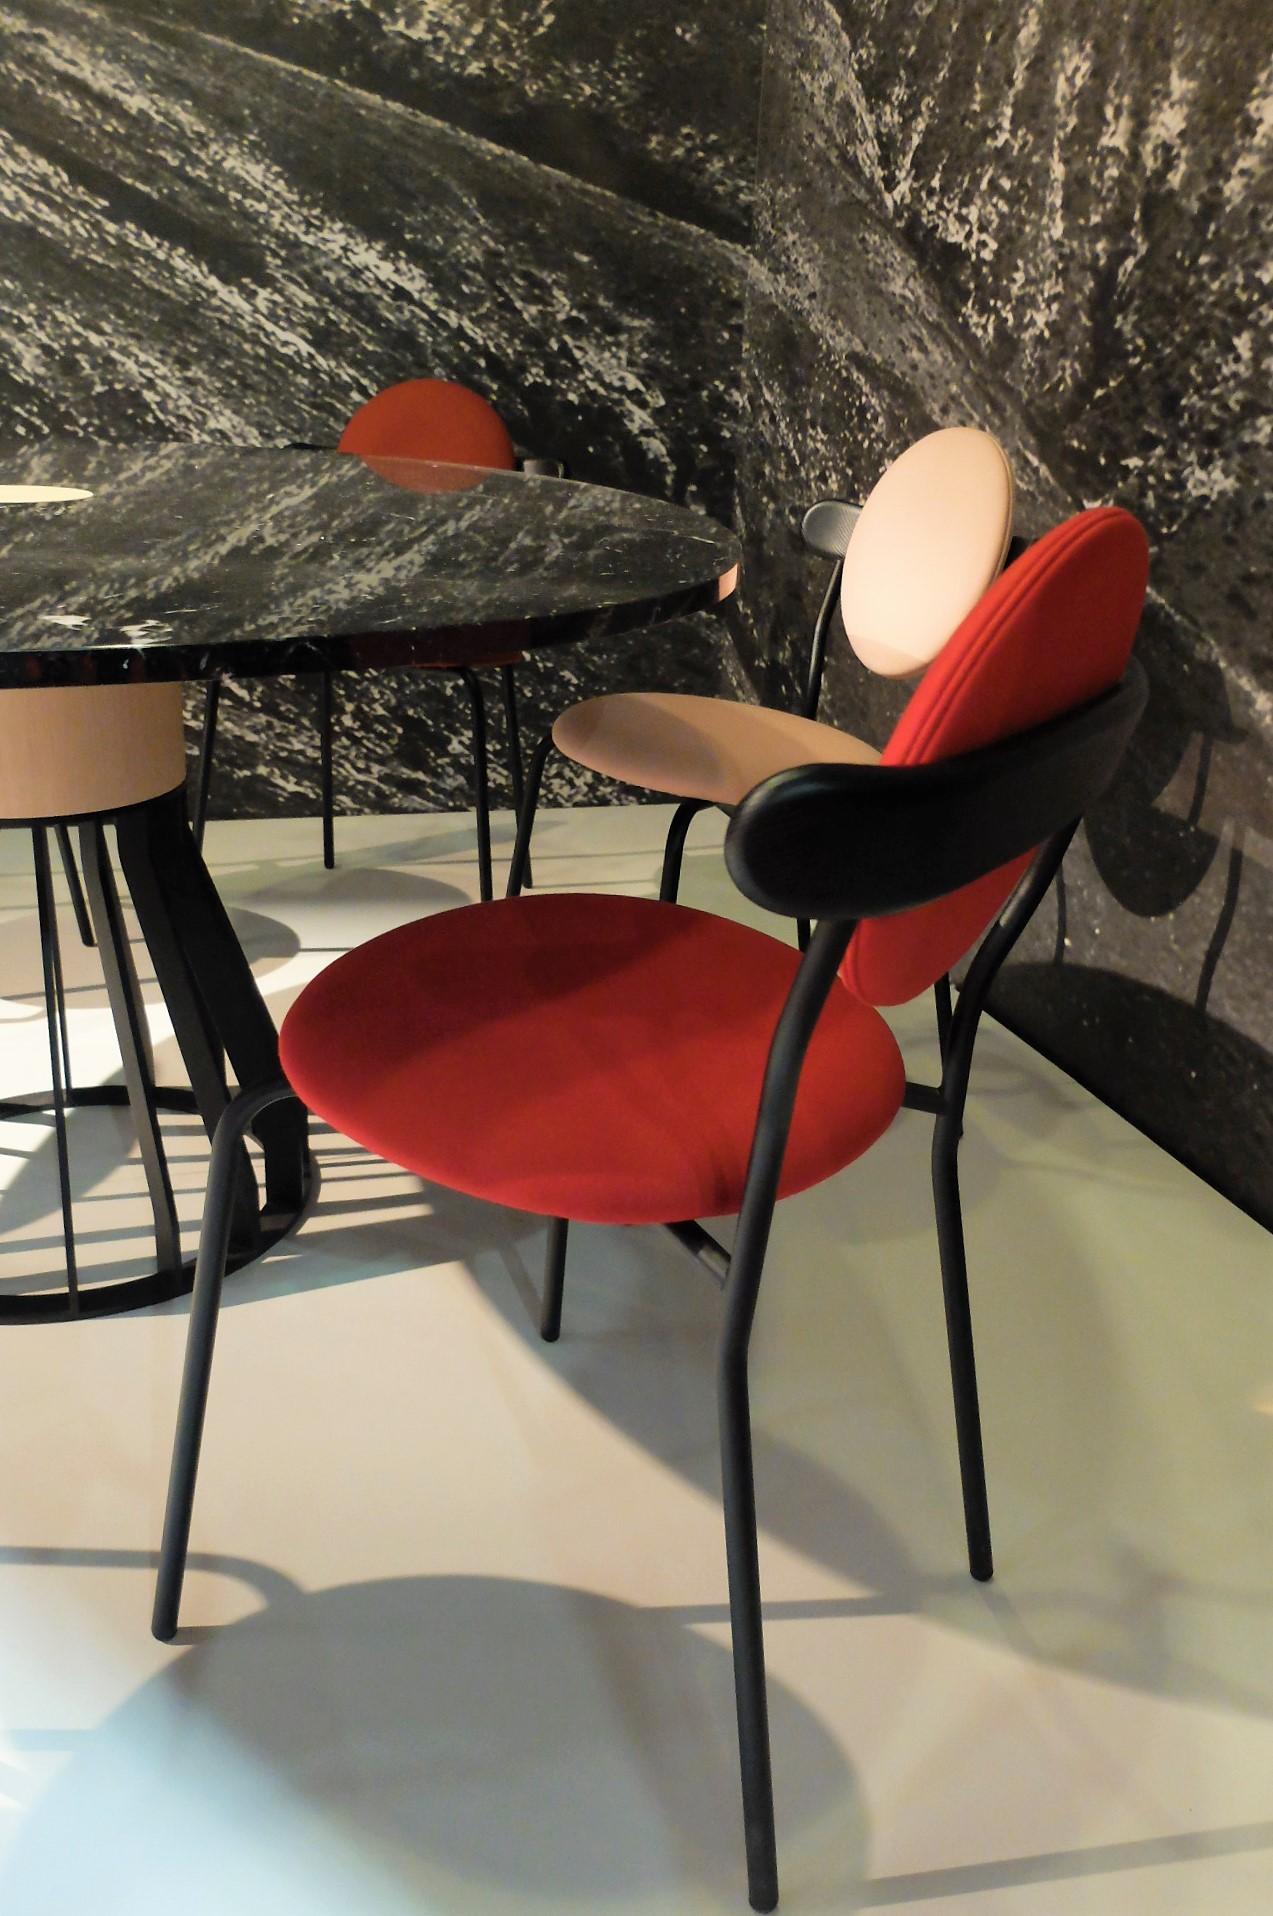 Planet chair by Jean-Baptiste Souletie. LA CHANCE